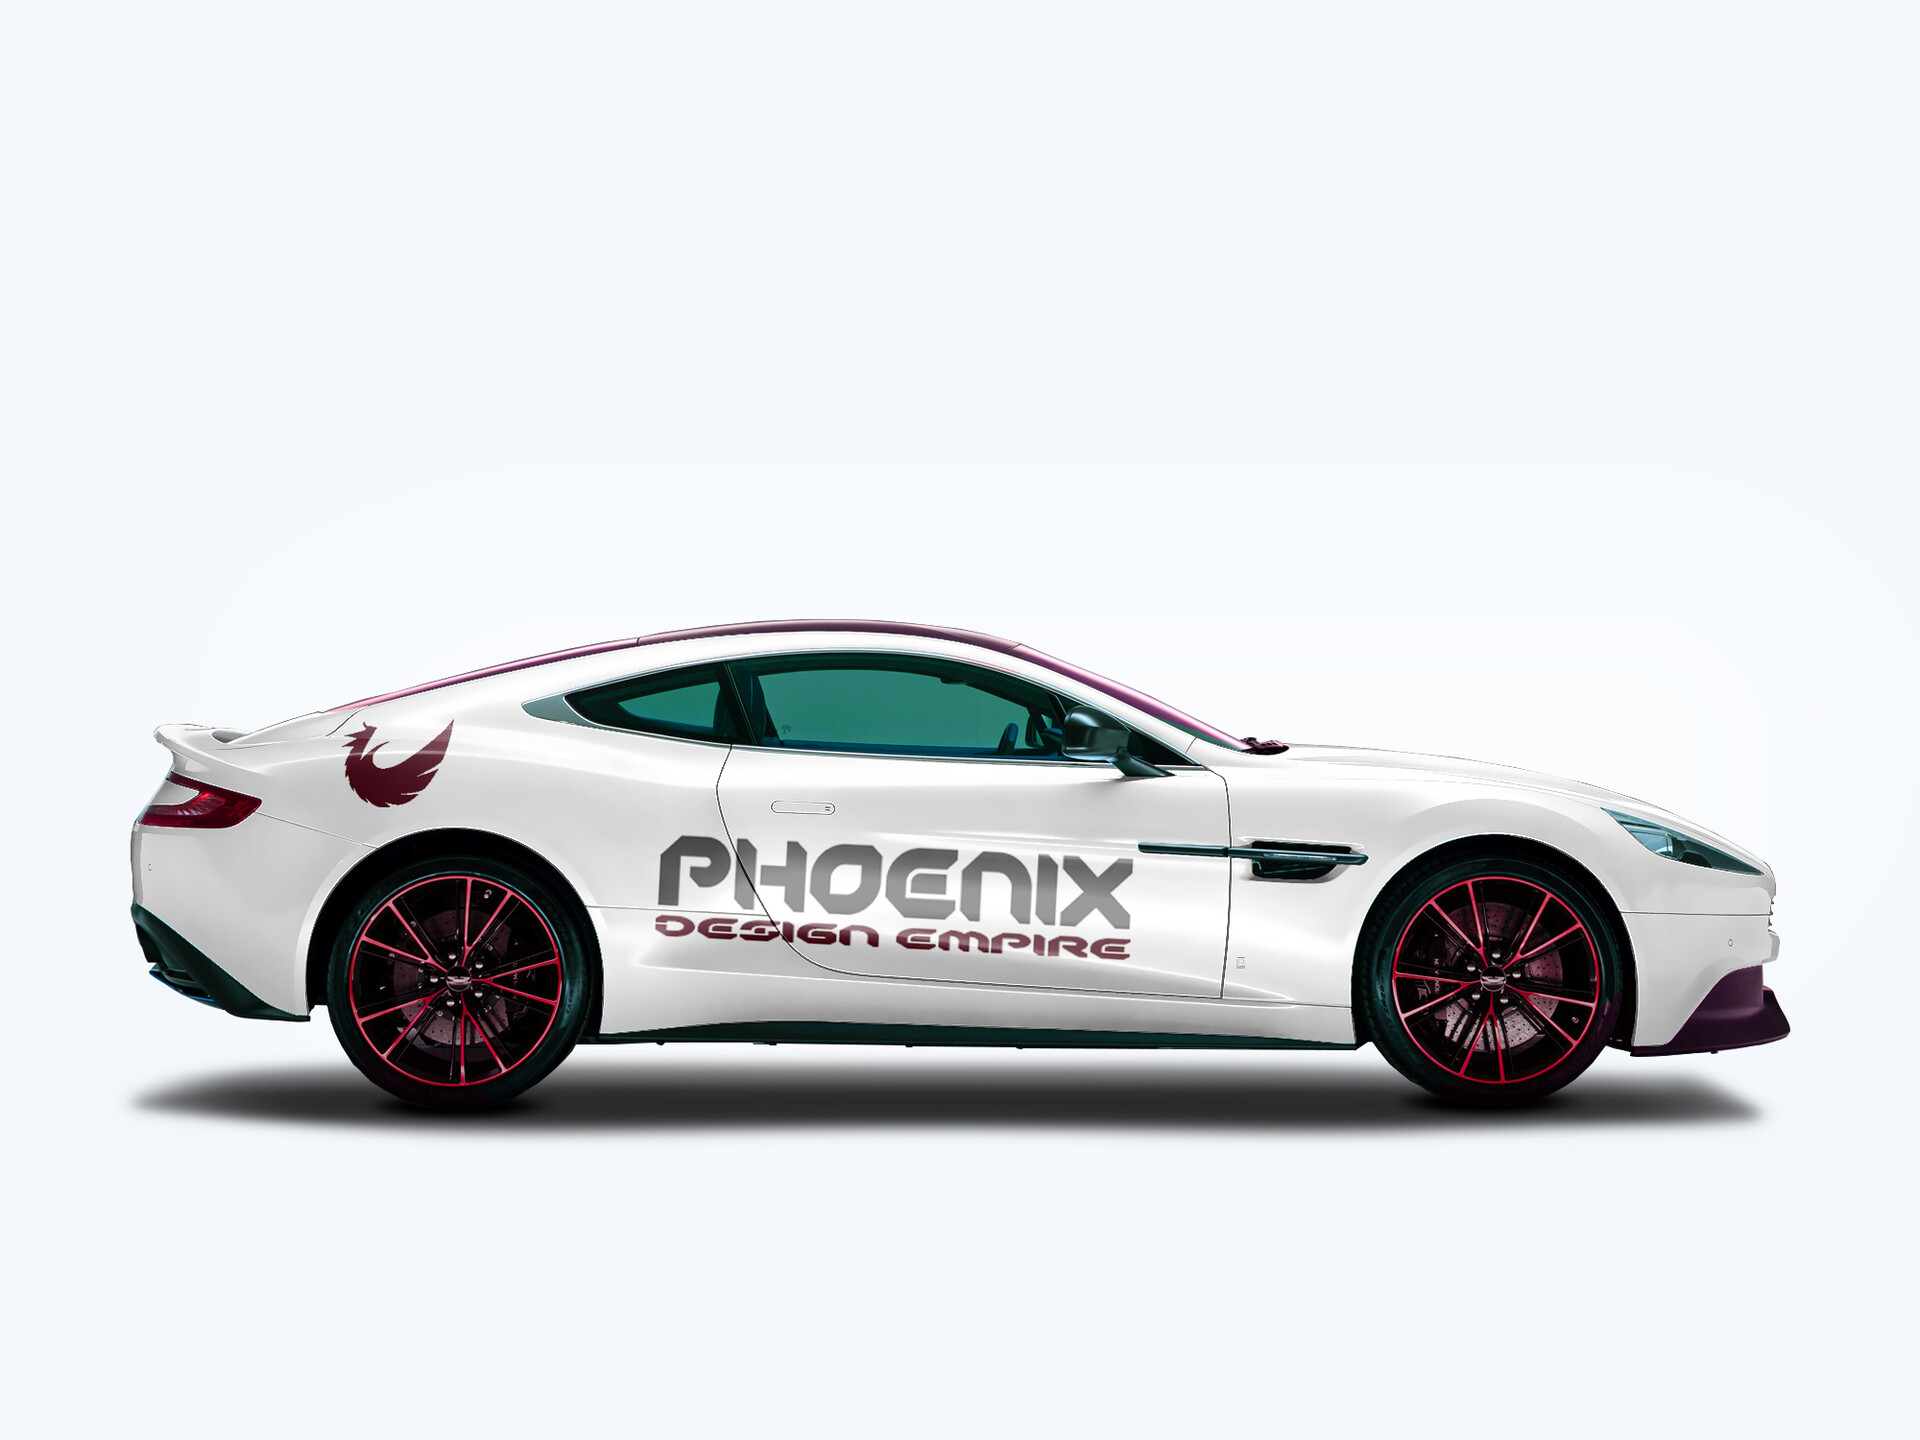 Bruce Phoenix Empire Aston Martin